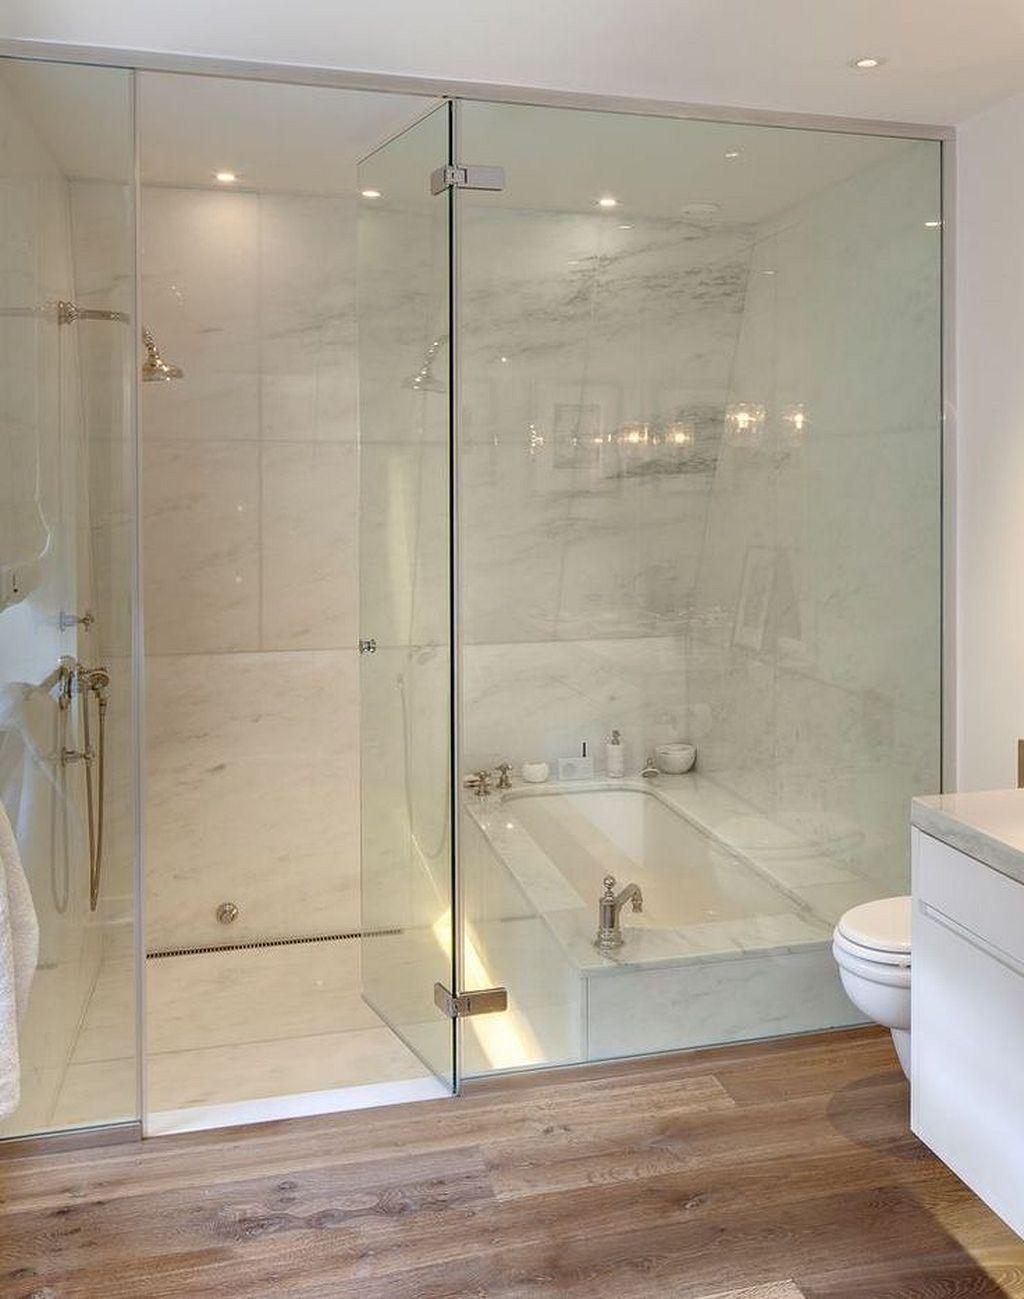 Small Bathroom Tub Shower Combo Ideas 37 Bathroom Tub Shower Combo Bathroom Tub Shower Shower Tub Combination